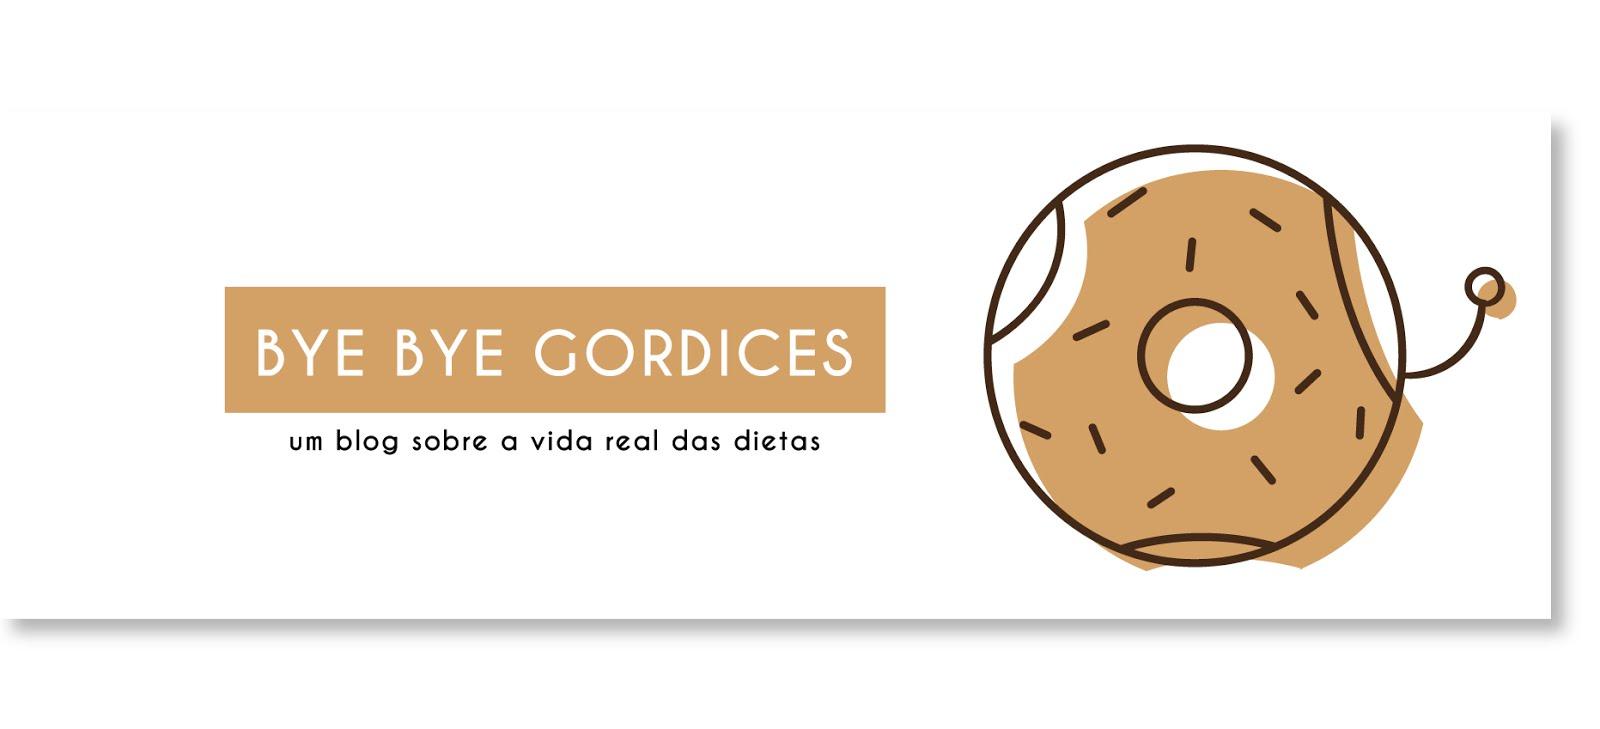 Bye Bye Gordices